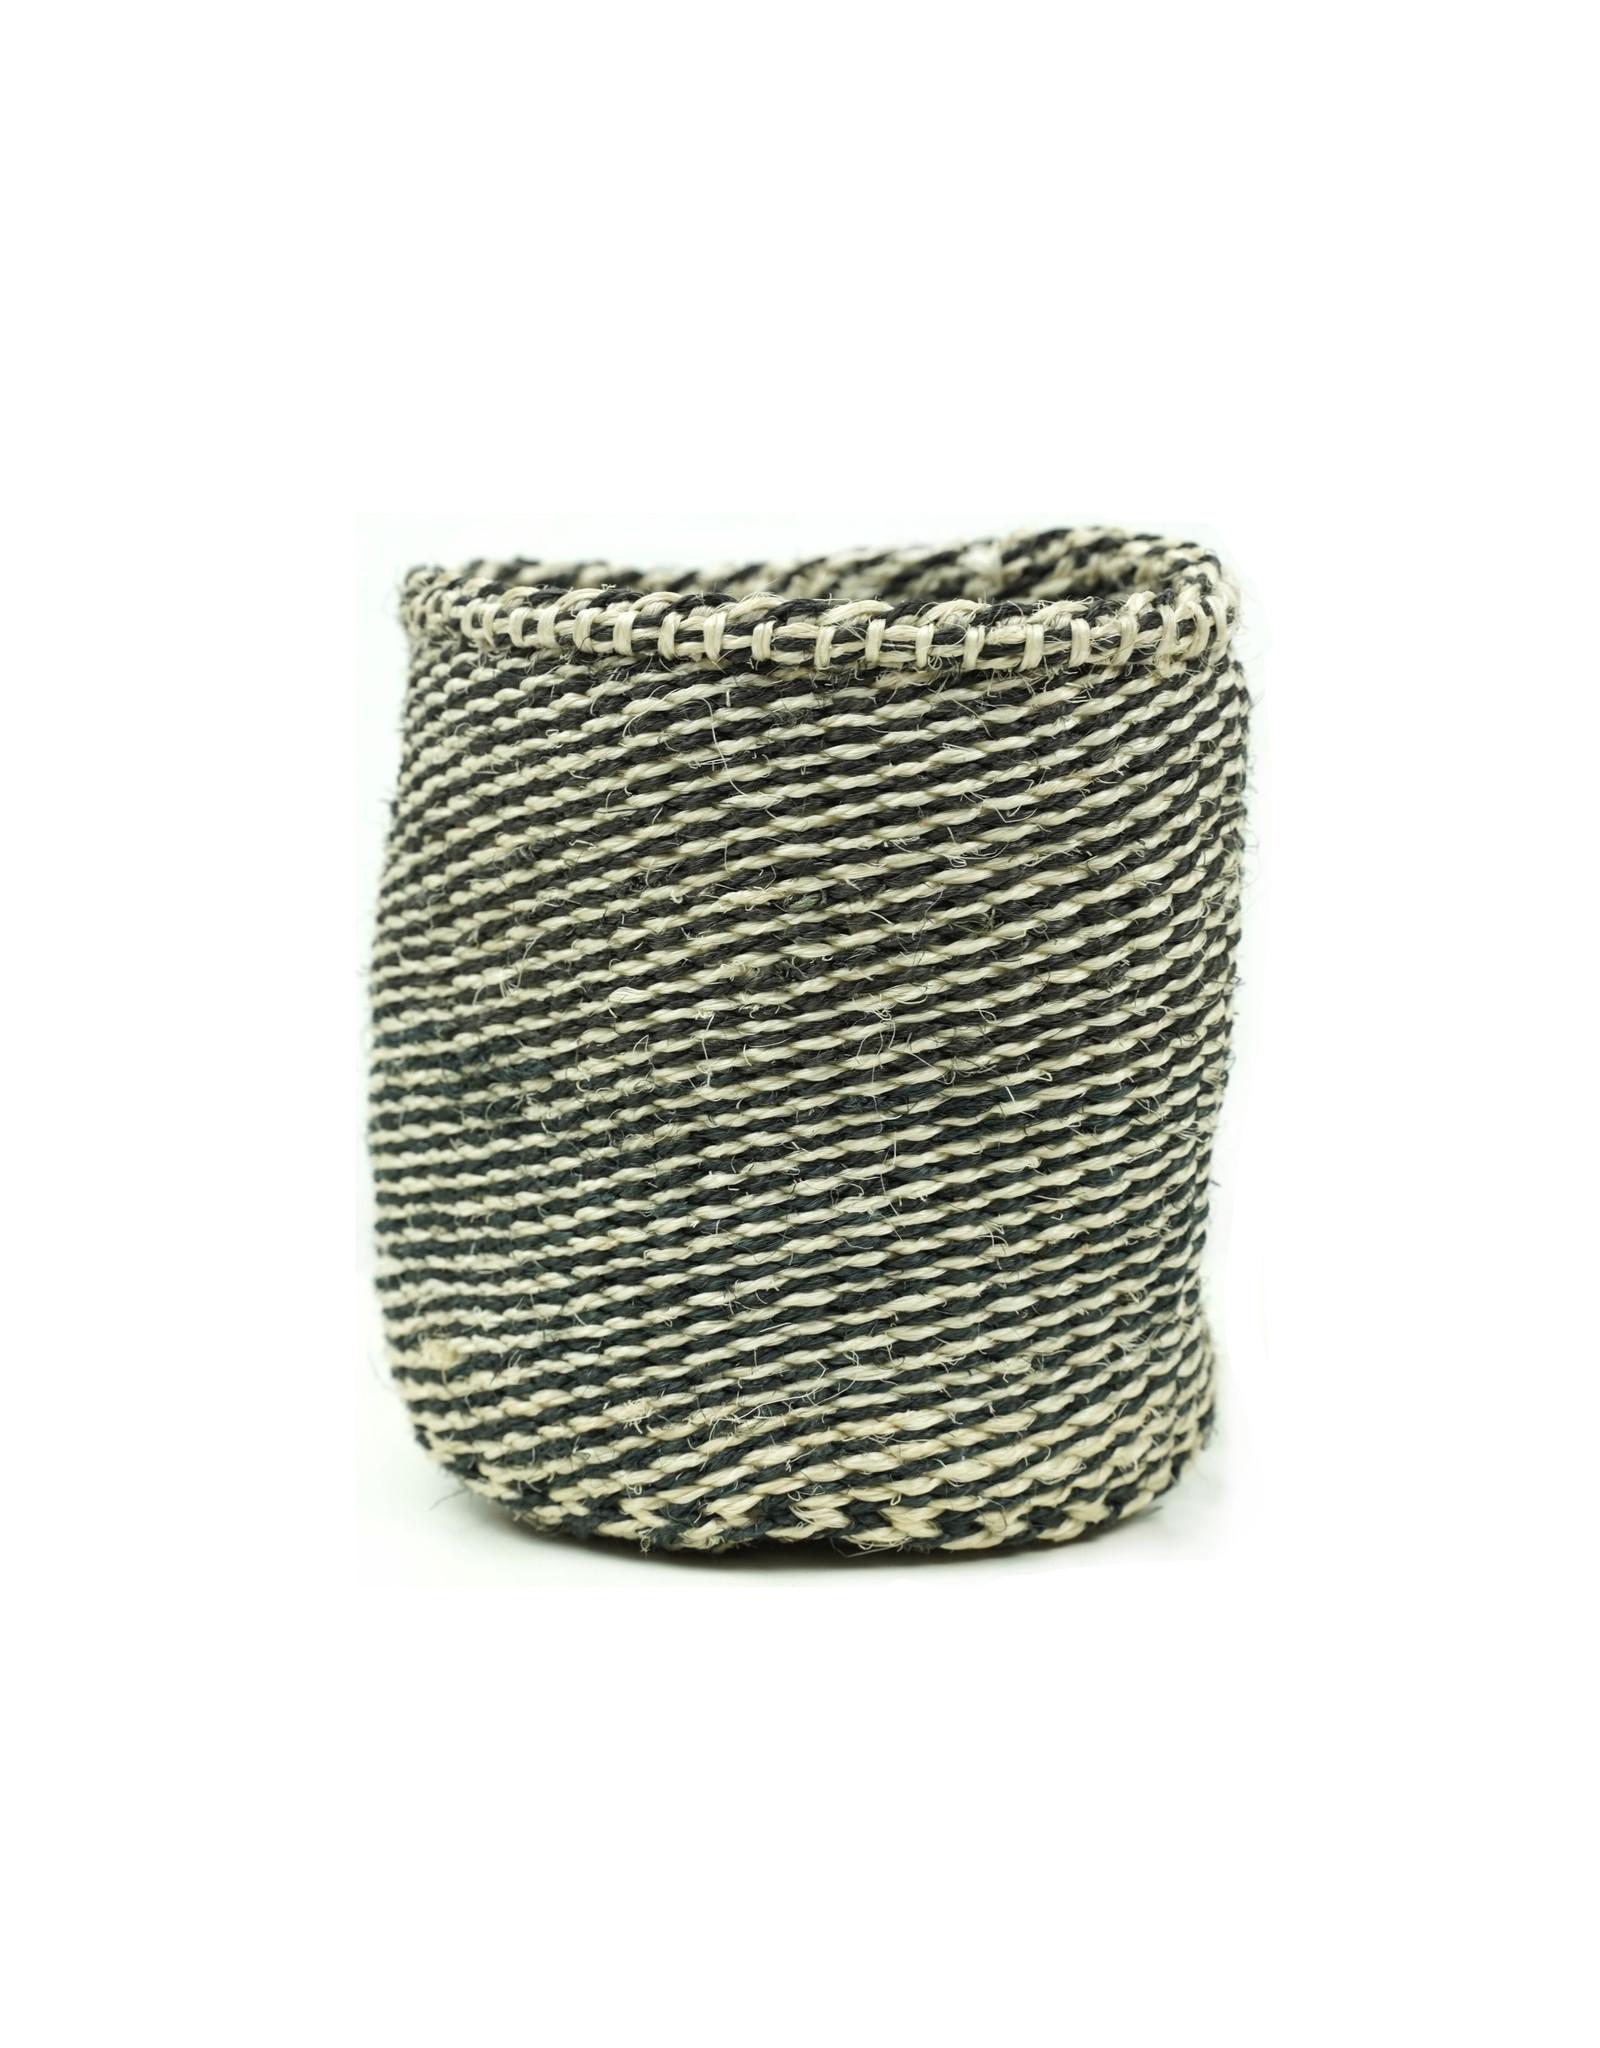 Maisha.Style Taita basket - black & ivory - S3